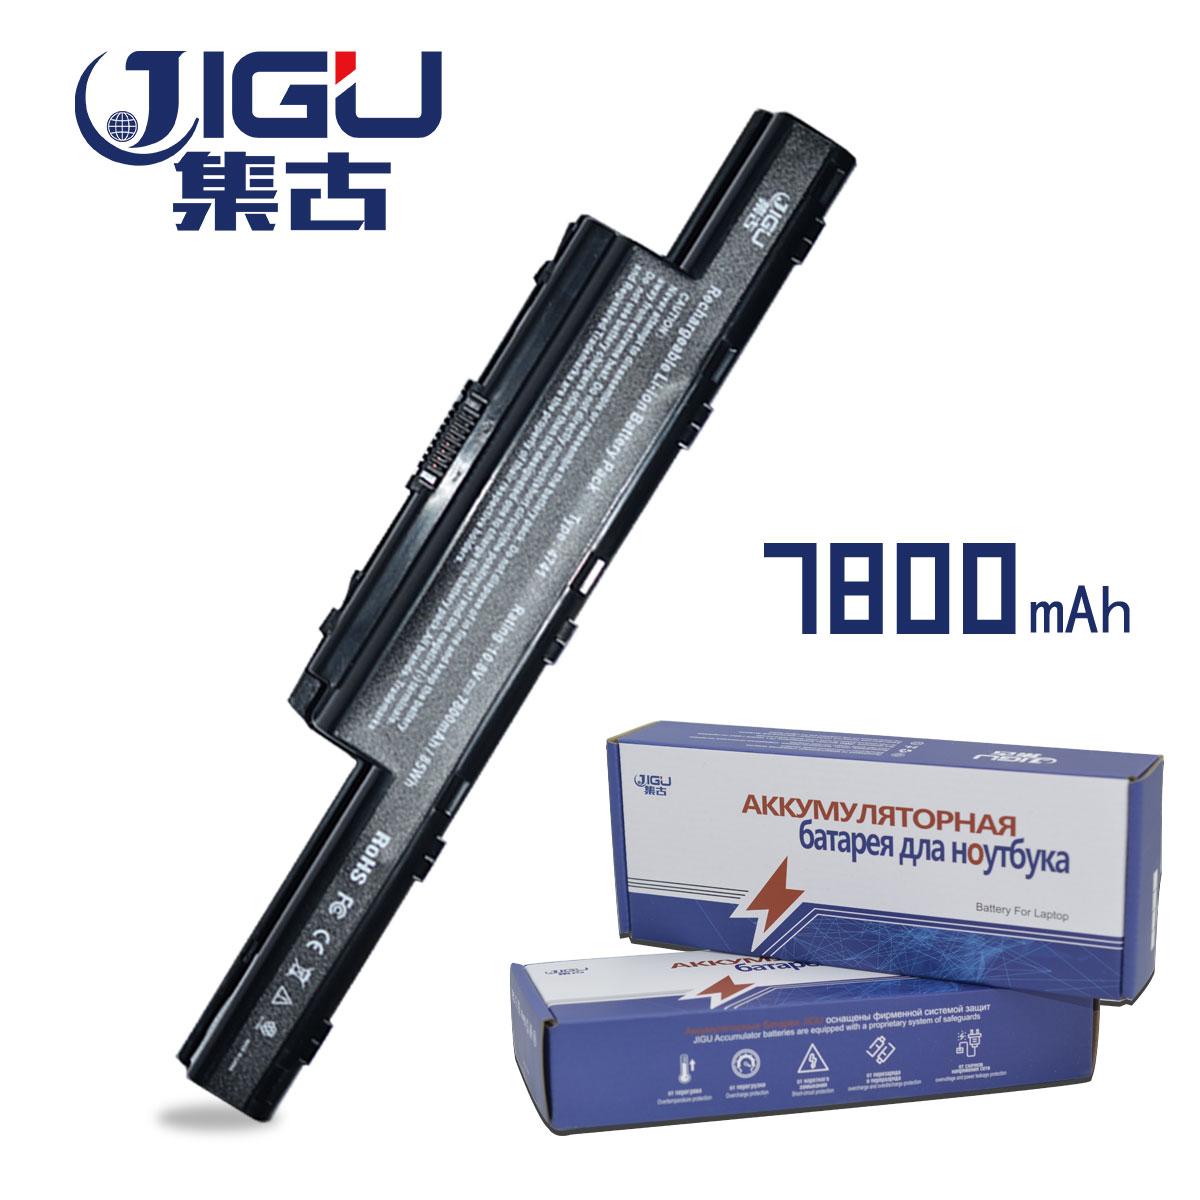 JIGU batería AS10D31 AS10D51 AS10D61 AS10D71 AS10D75 para Acer Aspire 5741G 7551 5736ZG 5750 5750G 5750TG 5750Z 5750ZG 5755